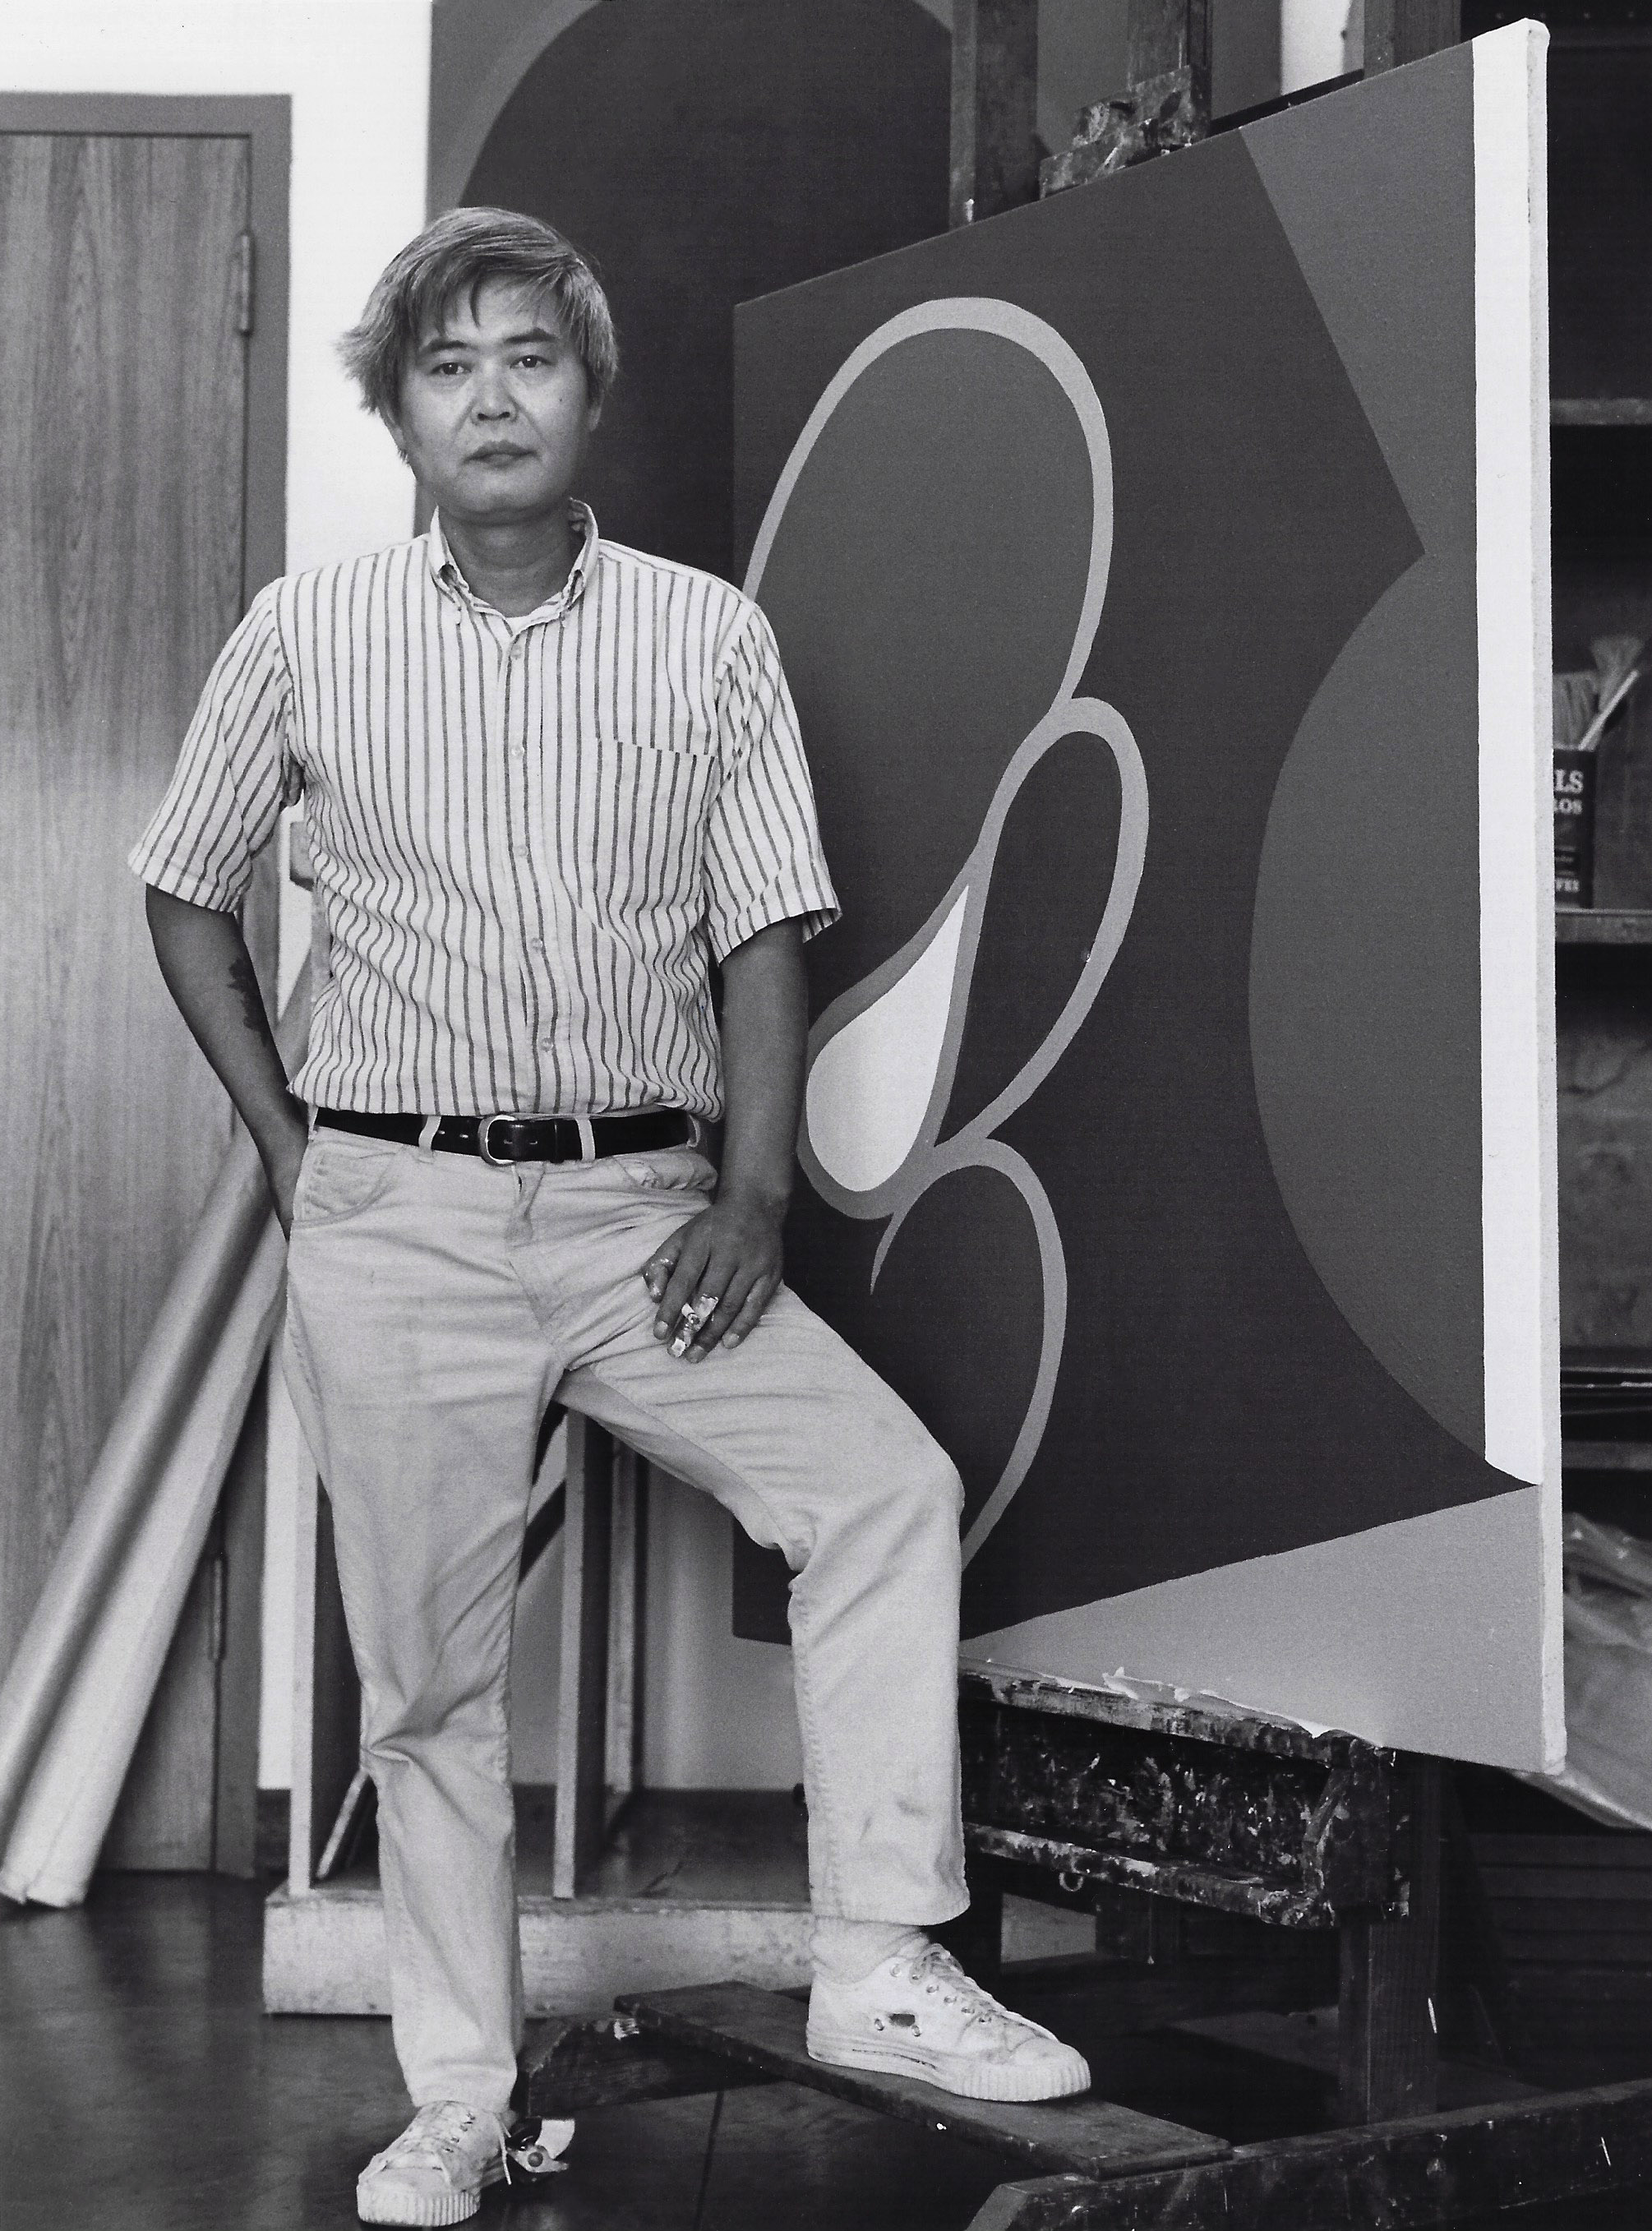 Kanemitsu at the Honolulu Academy of Arts, 1967. Photographed by Raymond M. Sato.